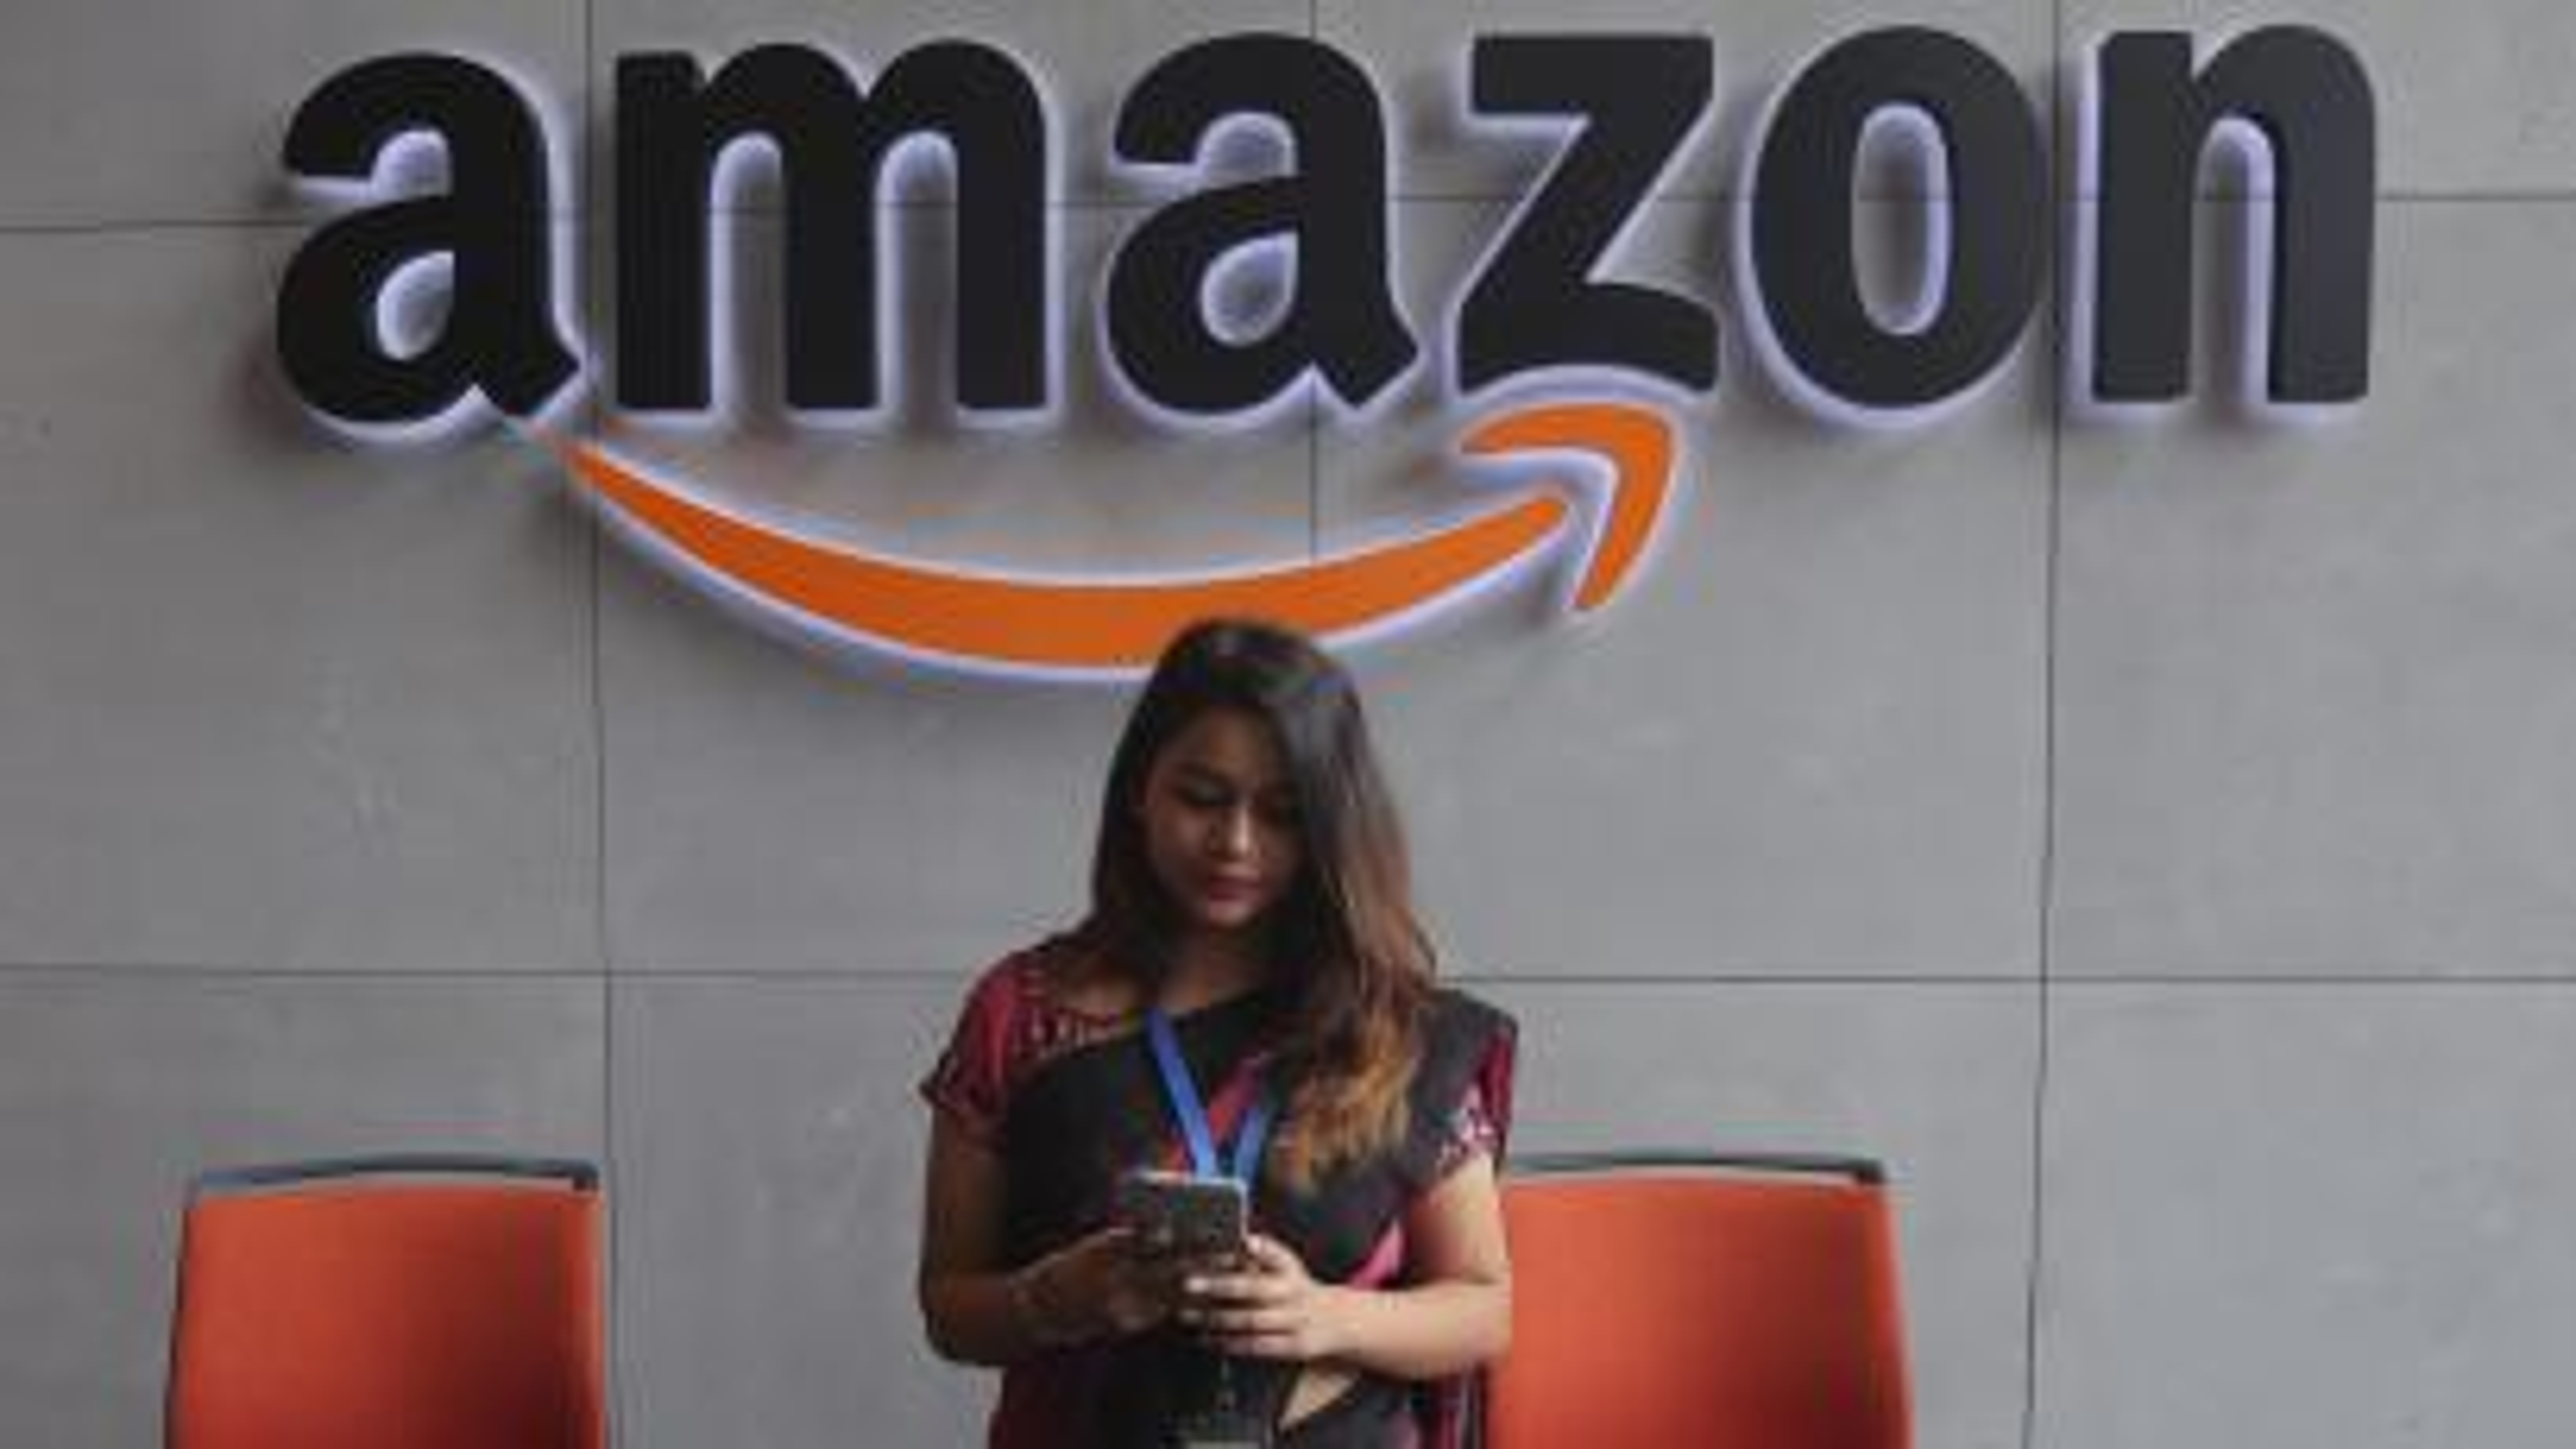 India Amazon